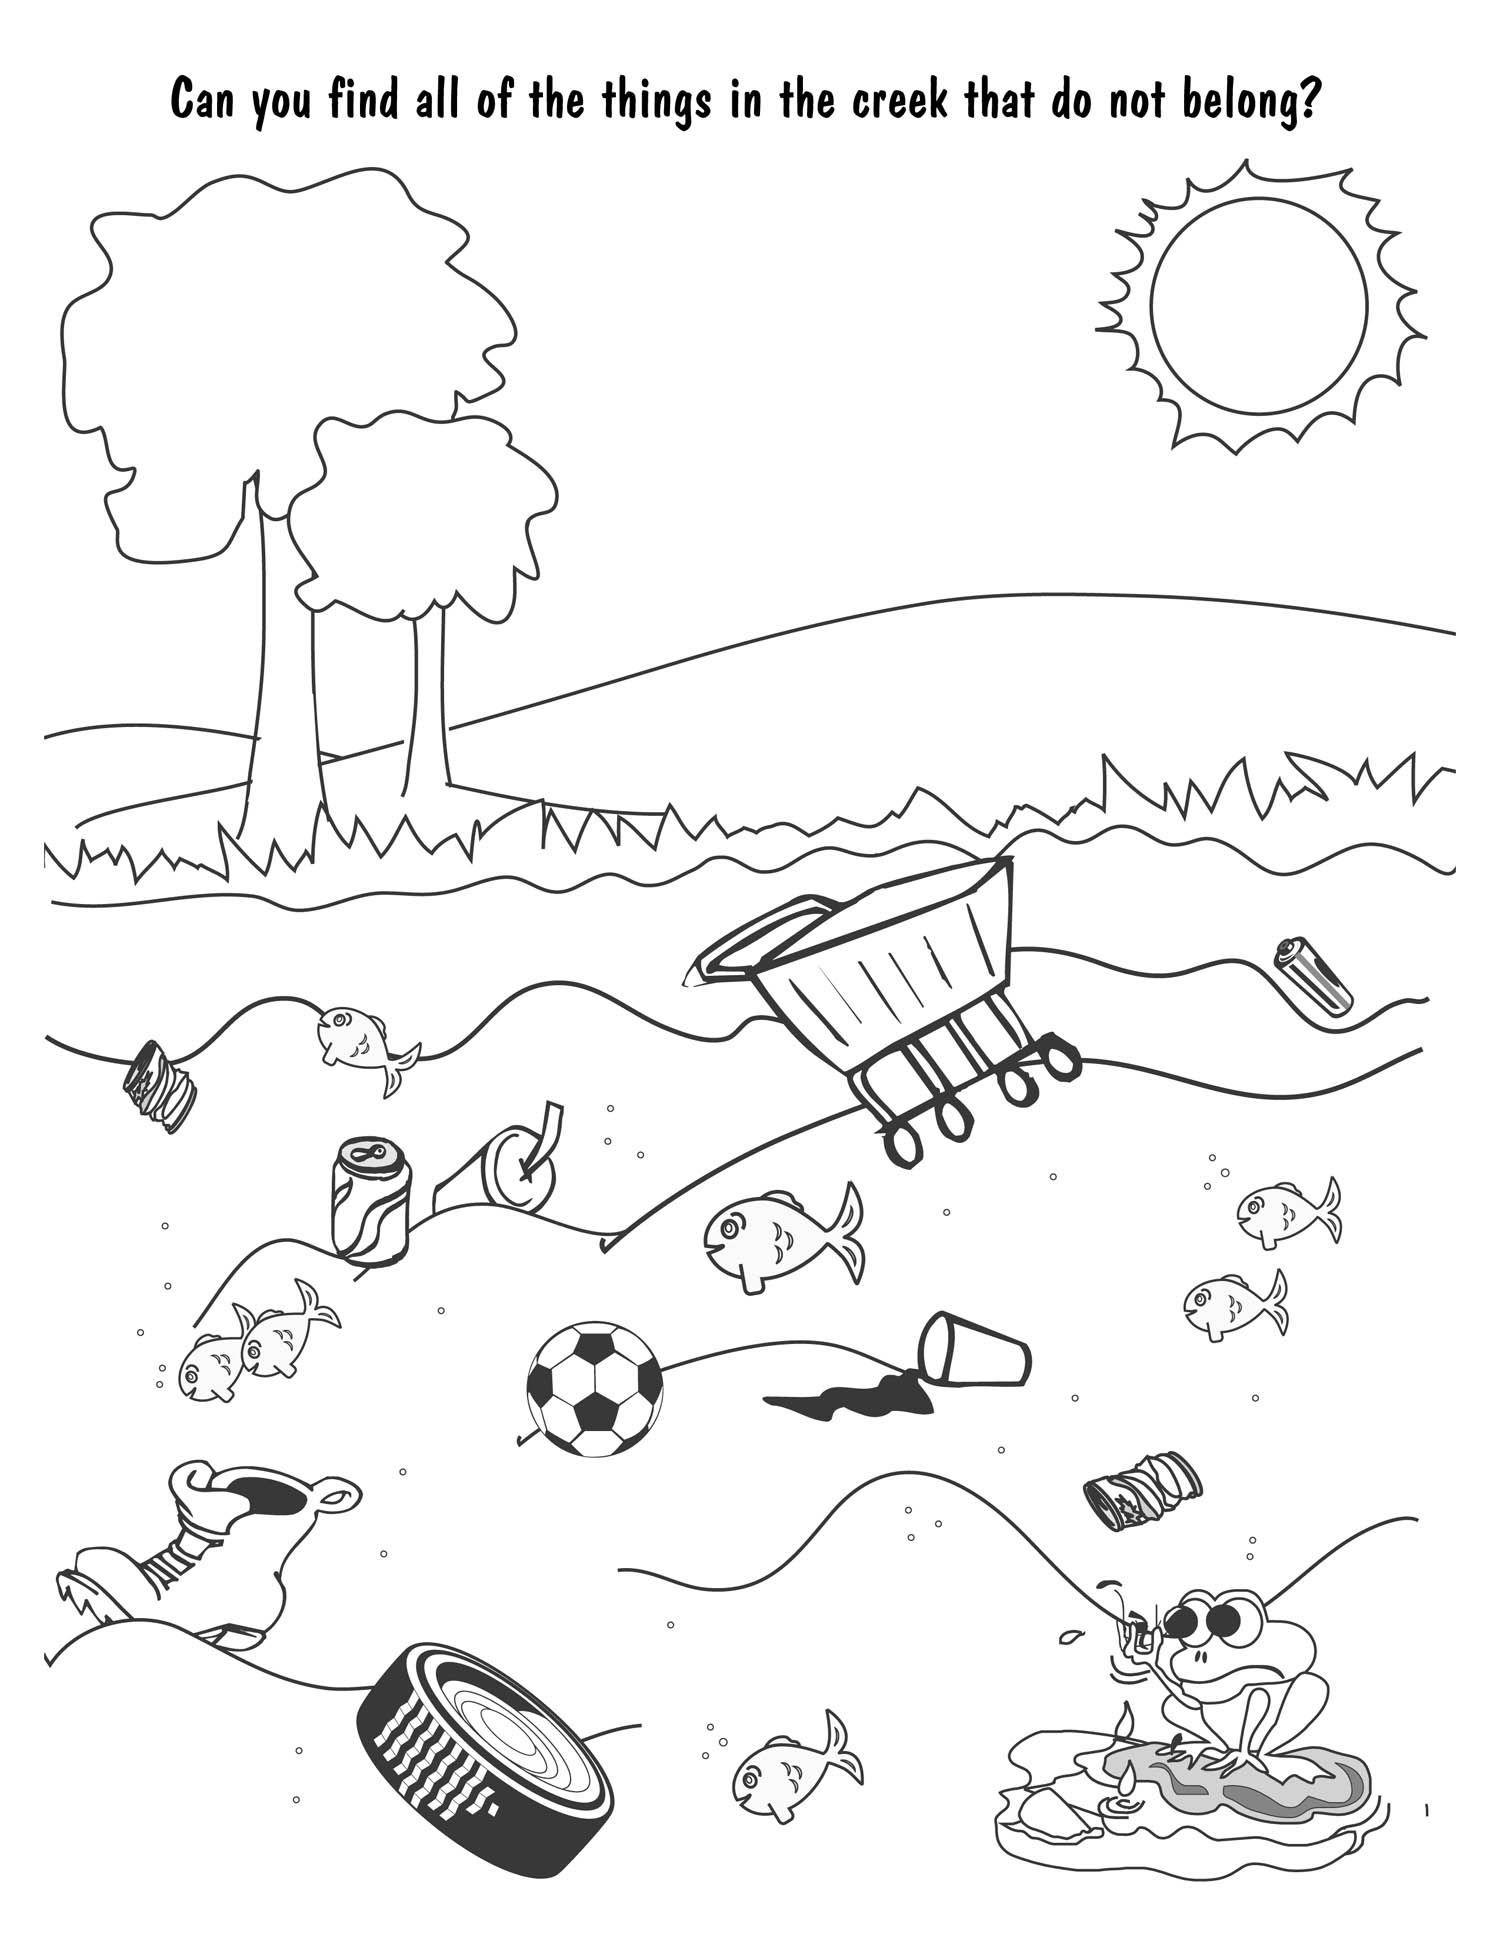 Worksheet On Land Supply